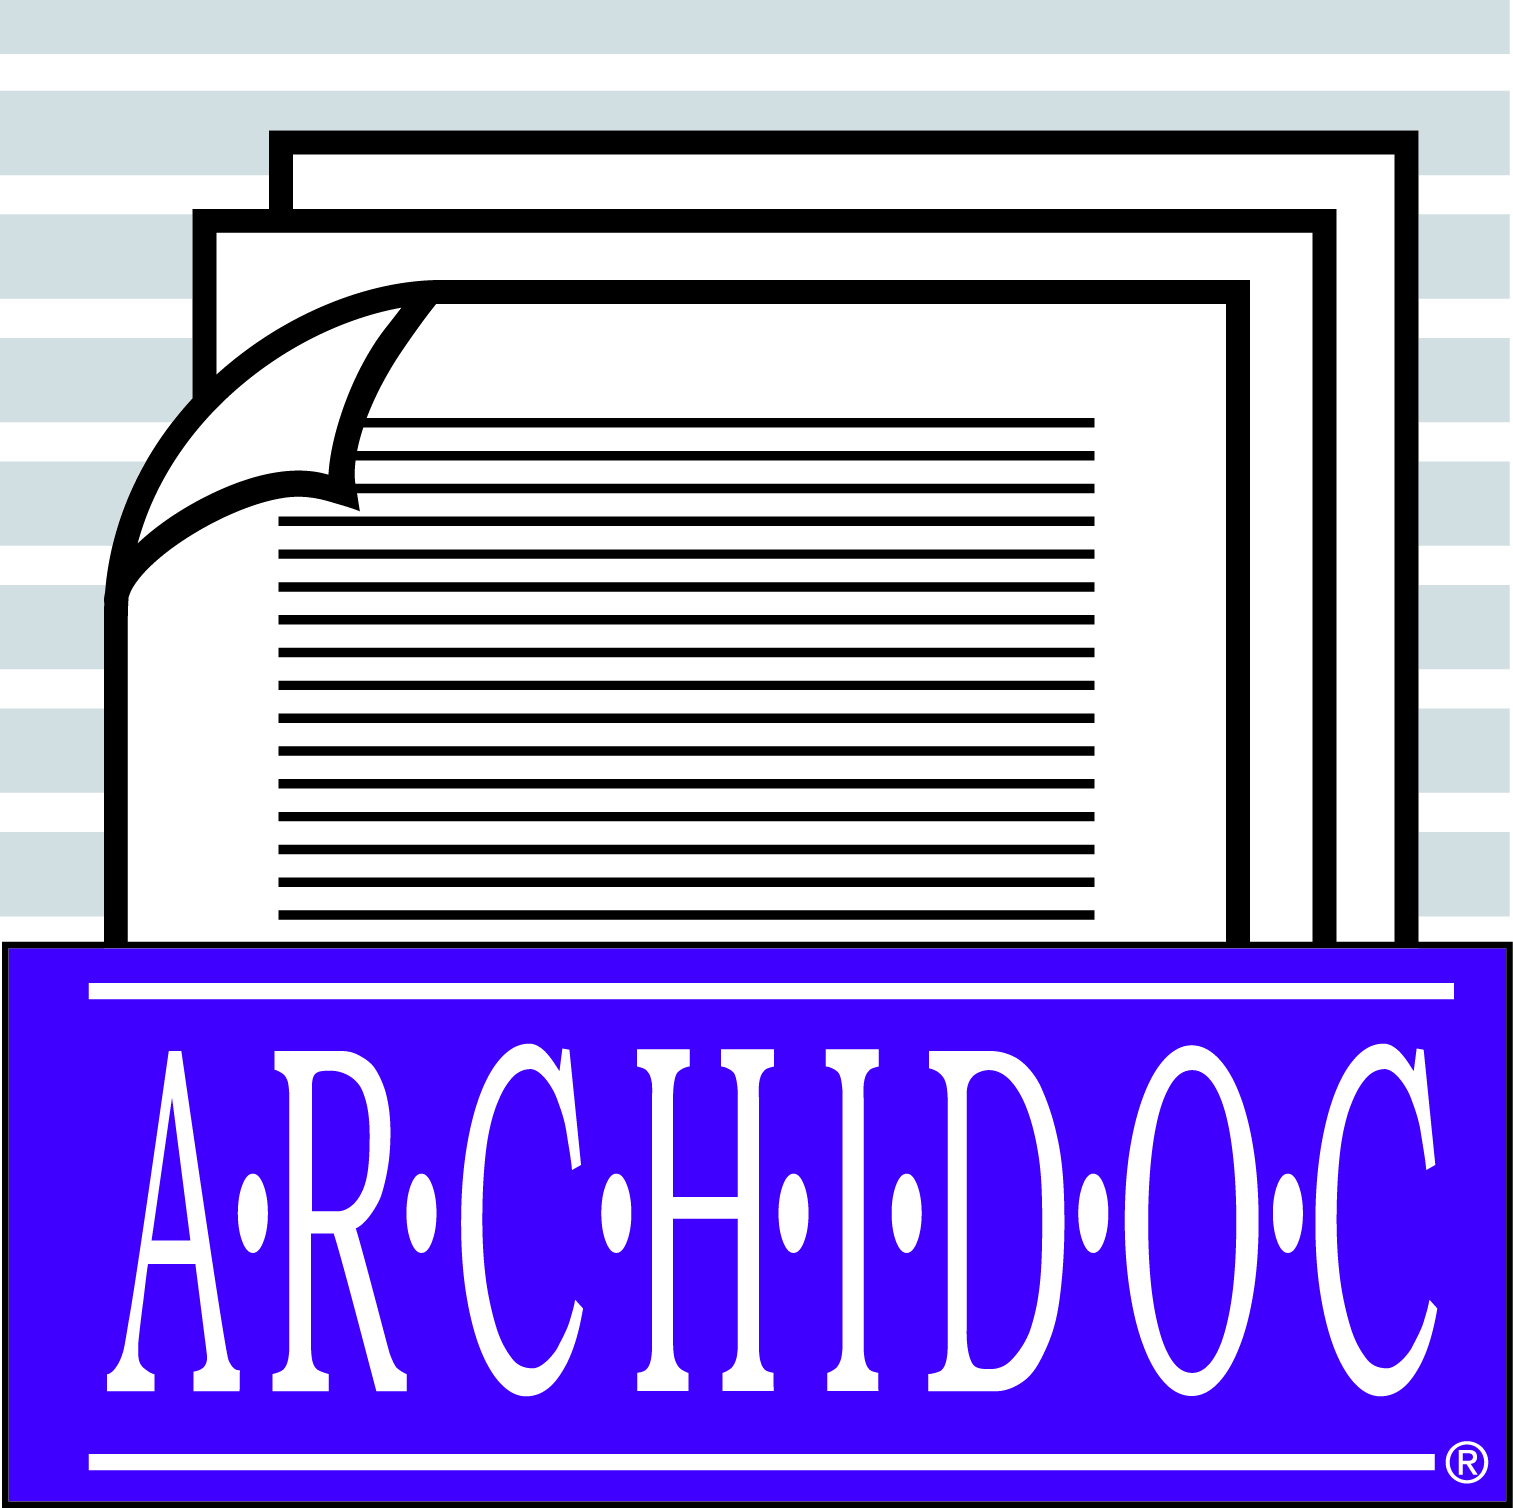 logo archidoc